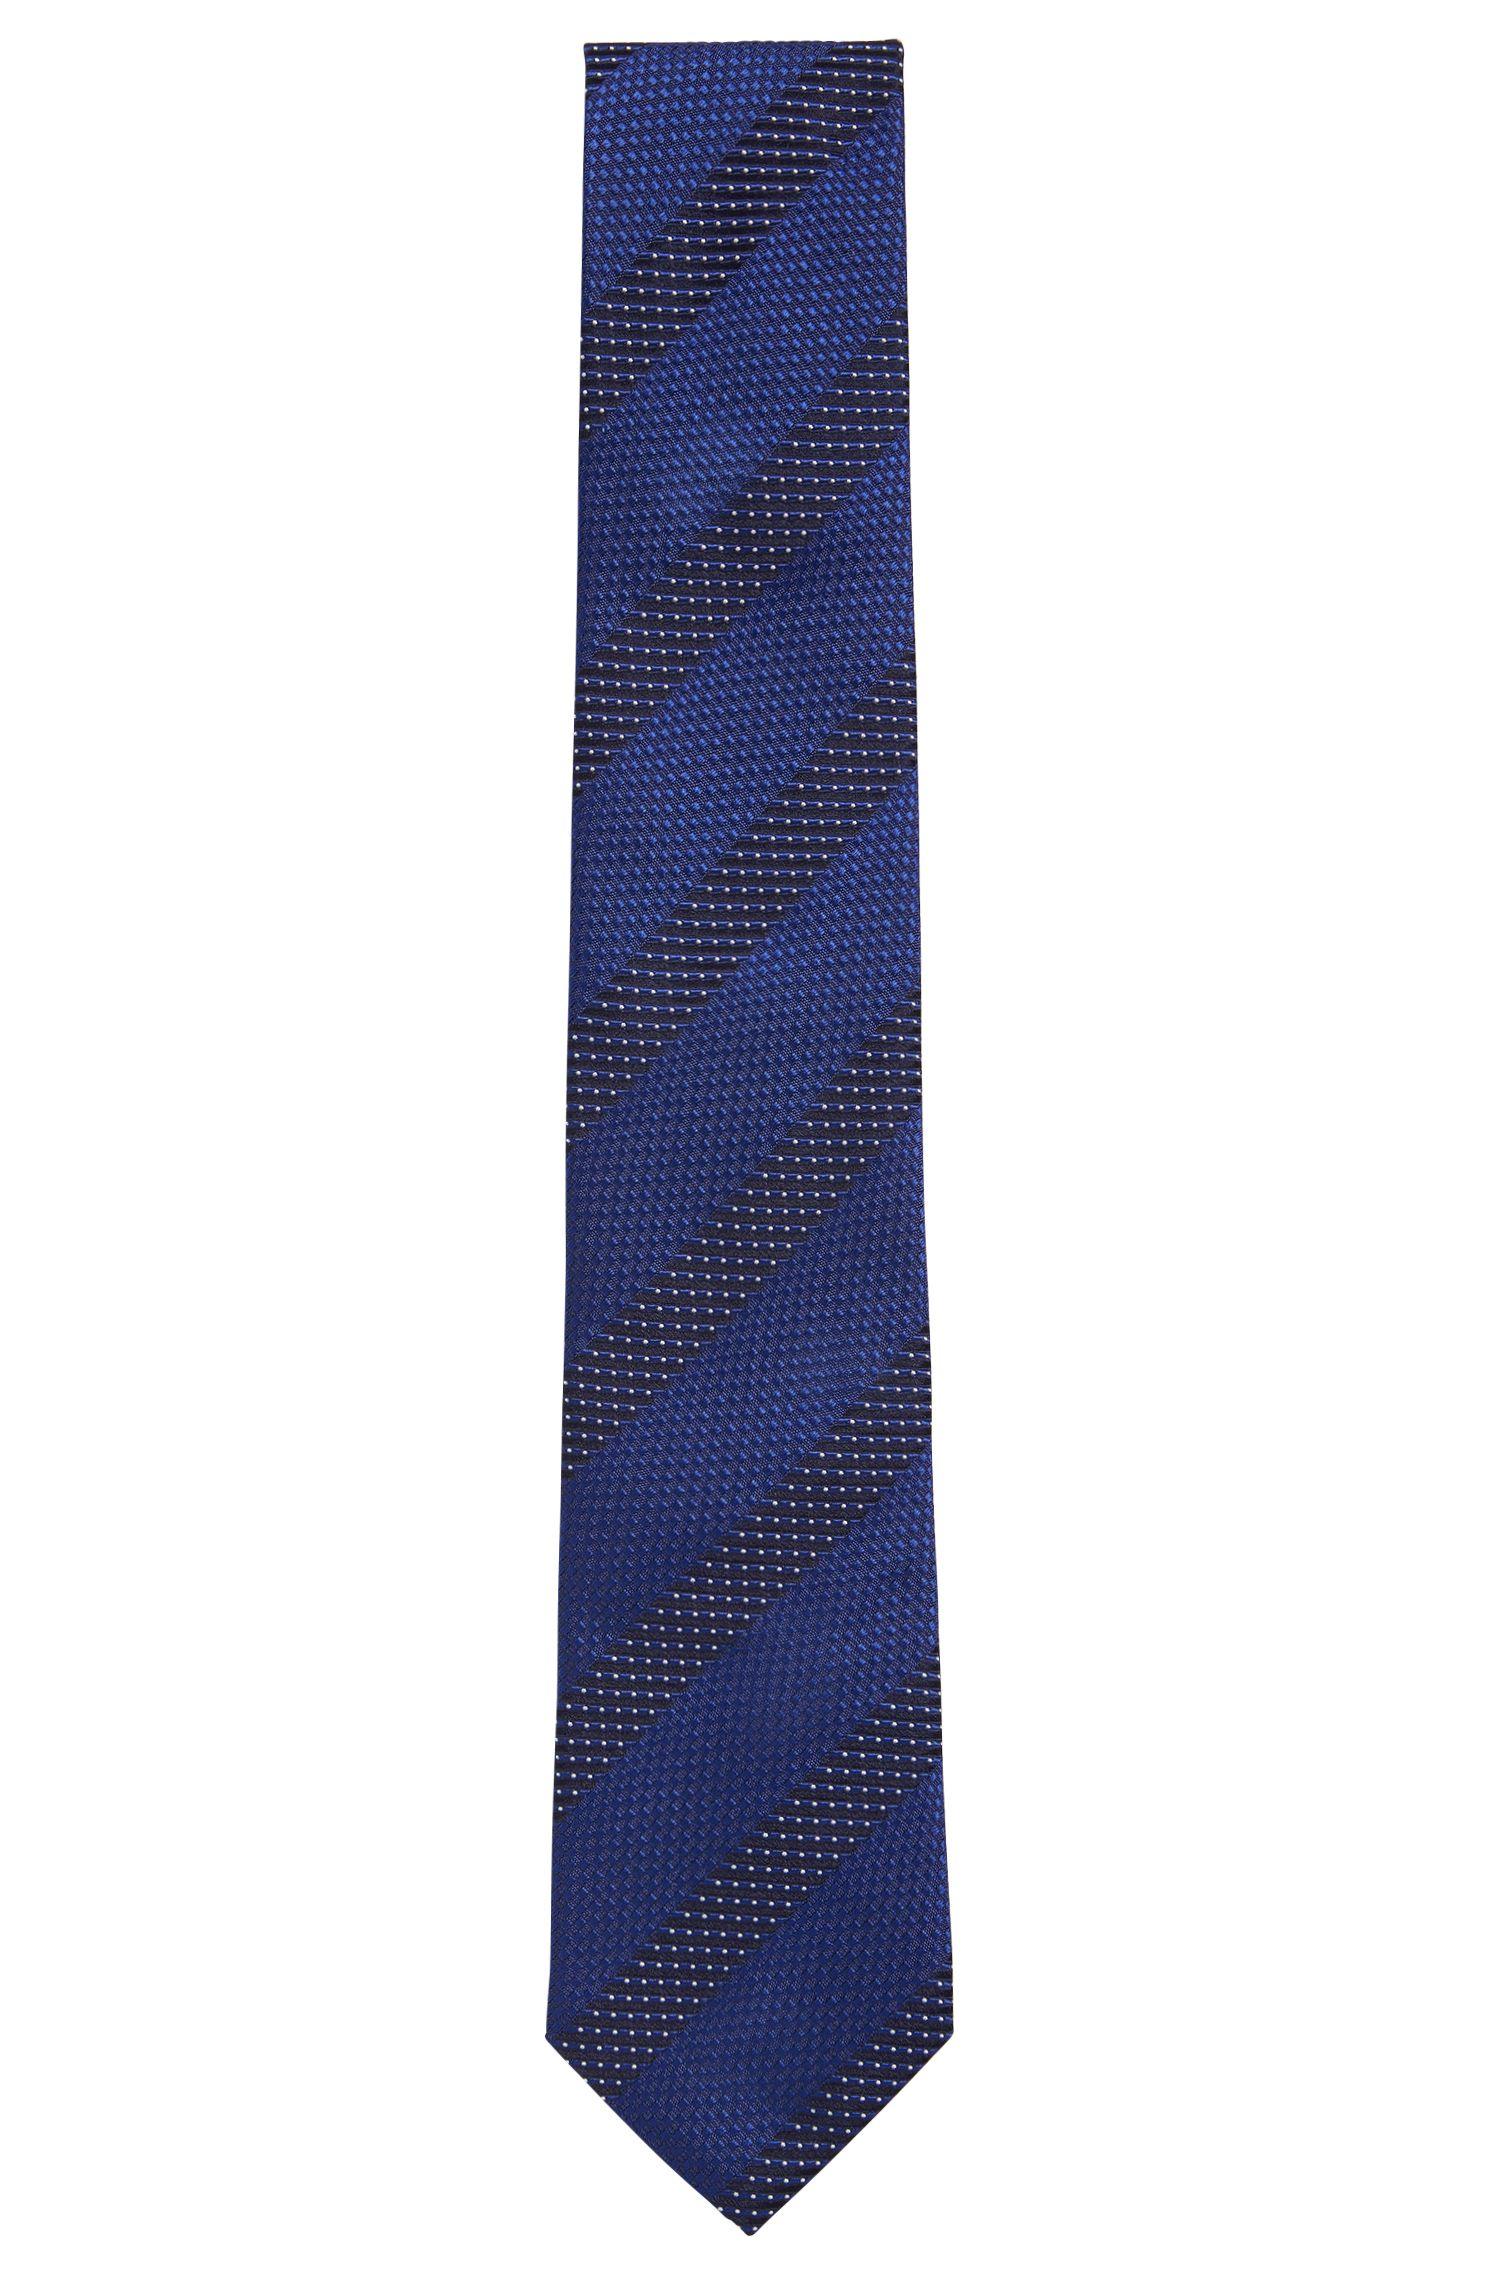 Patterened Italian Silk Tie